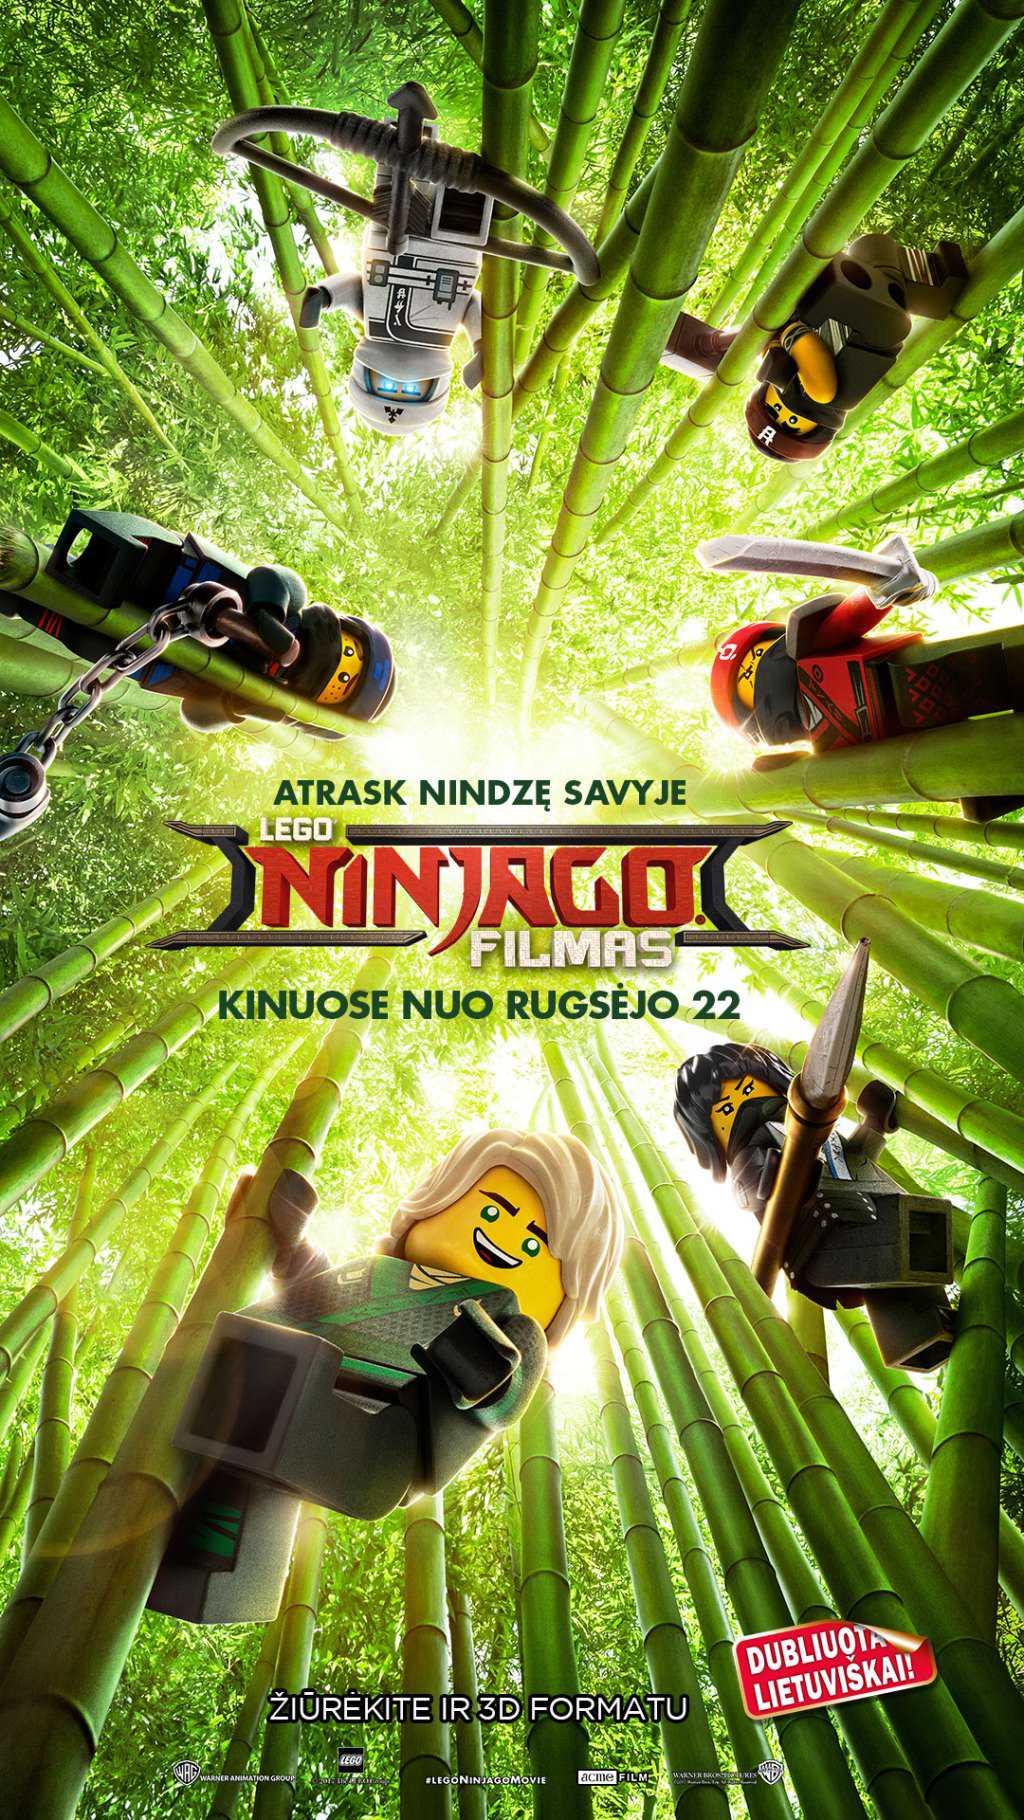 Lego Ninjago filmas (The LEGO Ninjago Movie)